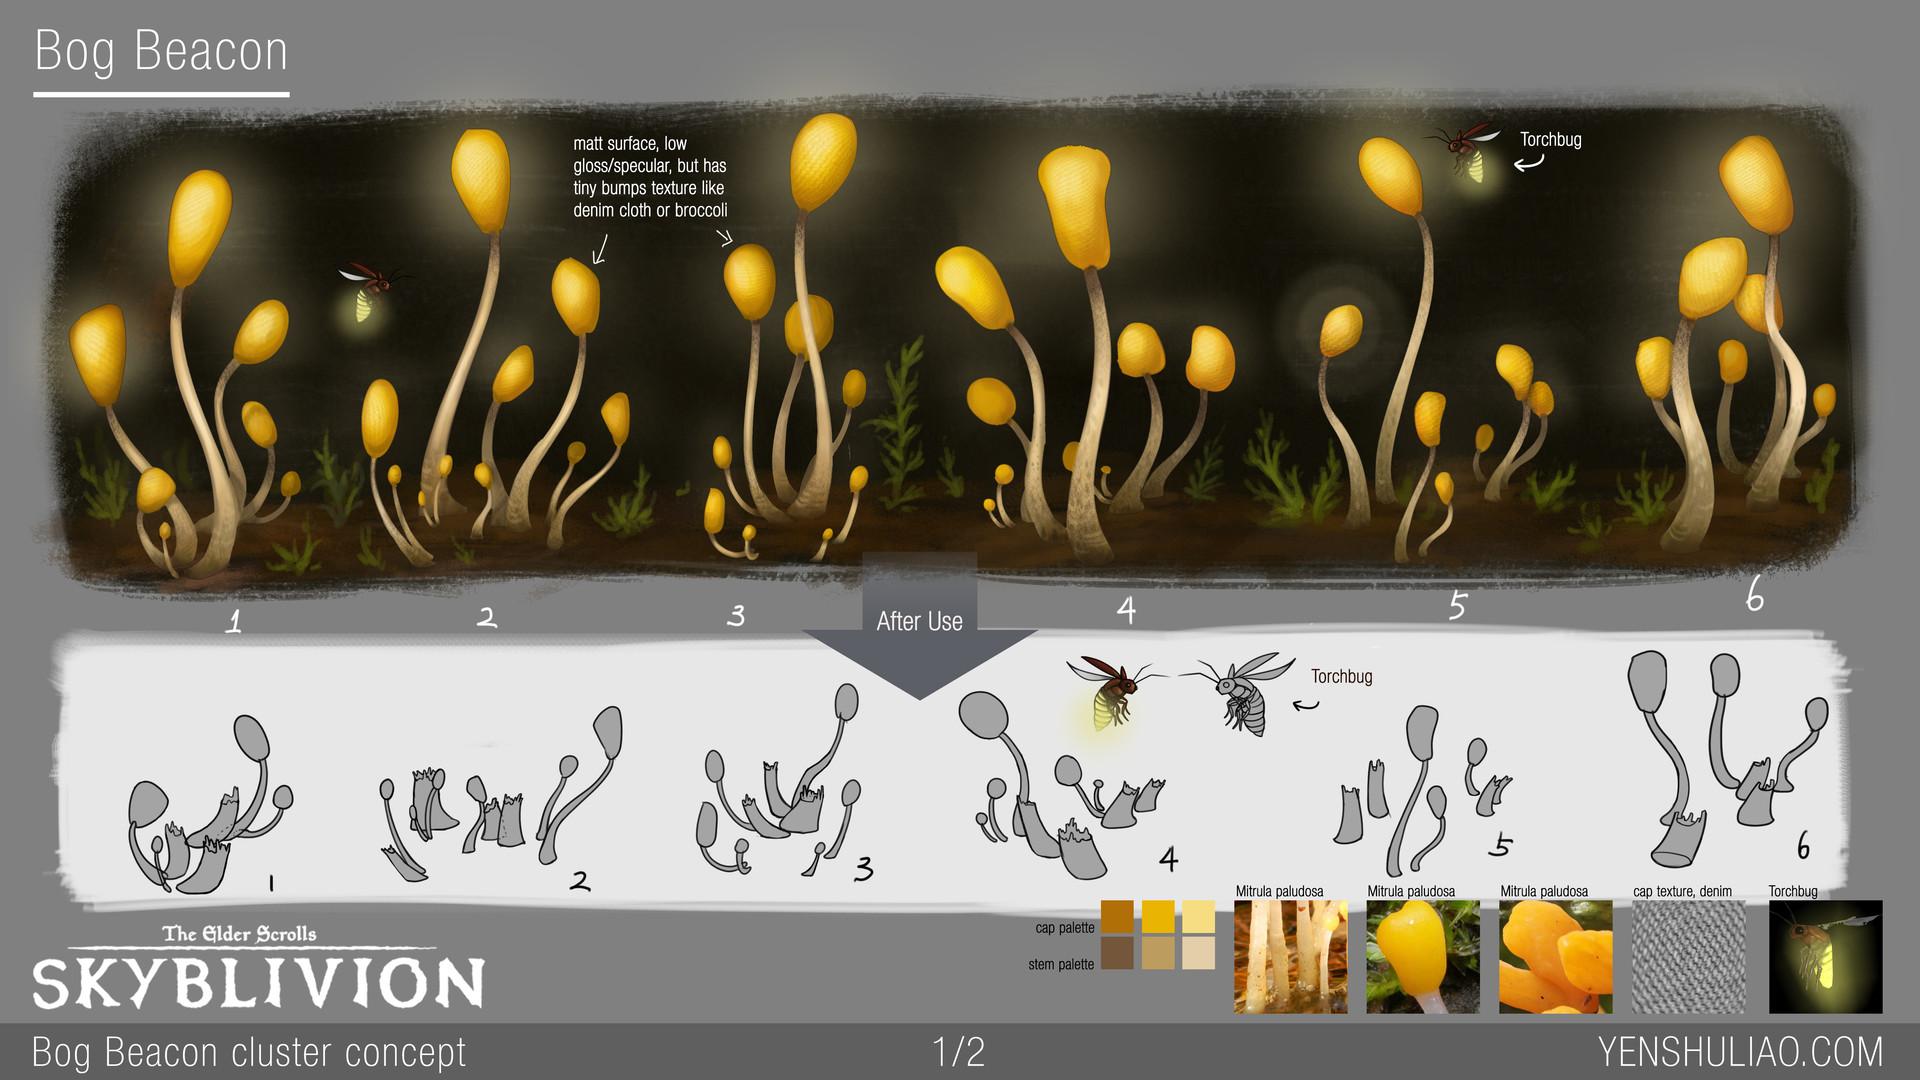 Yen shu liao mushroom environment prop concept yen shu liao skyblivion bogbeacon 01